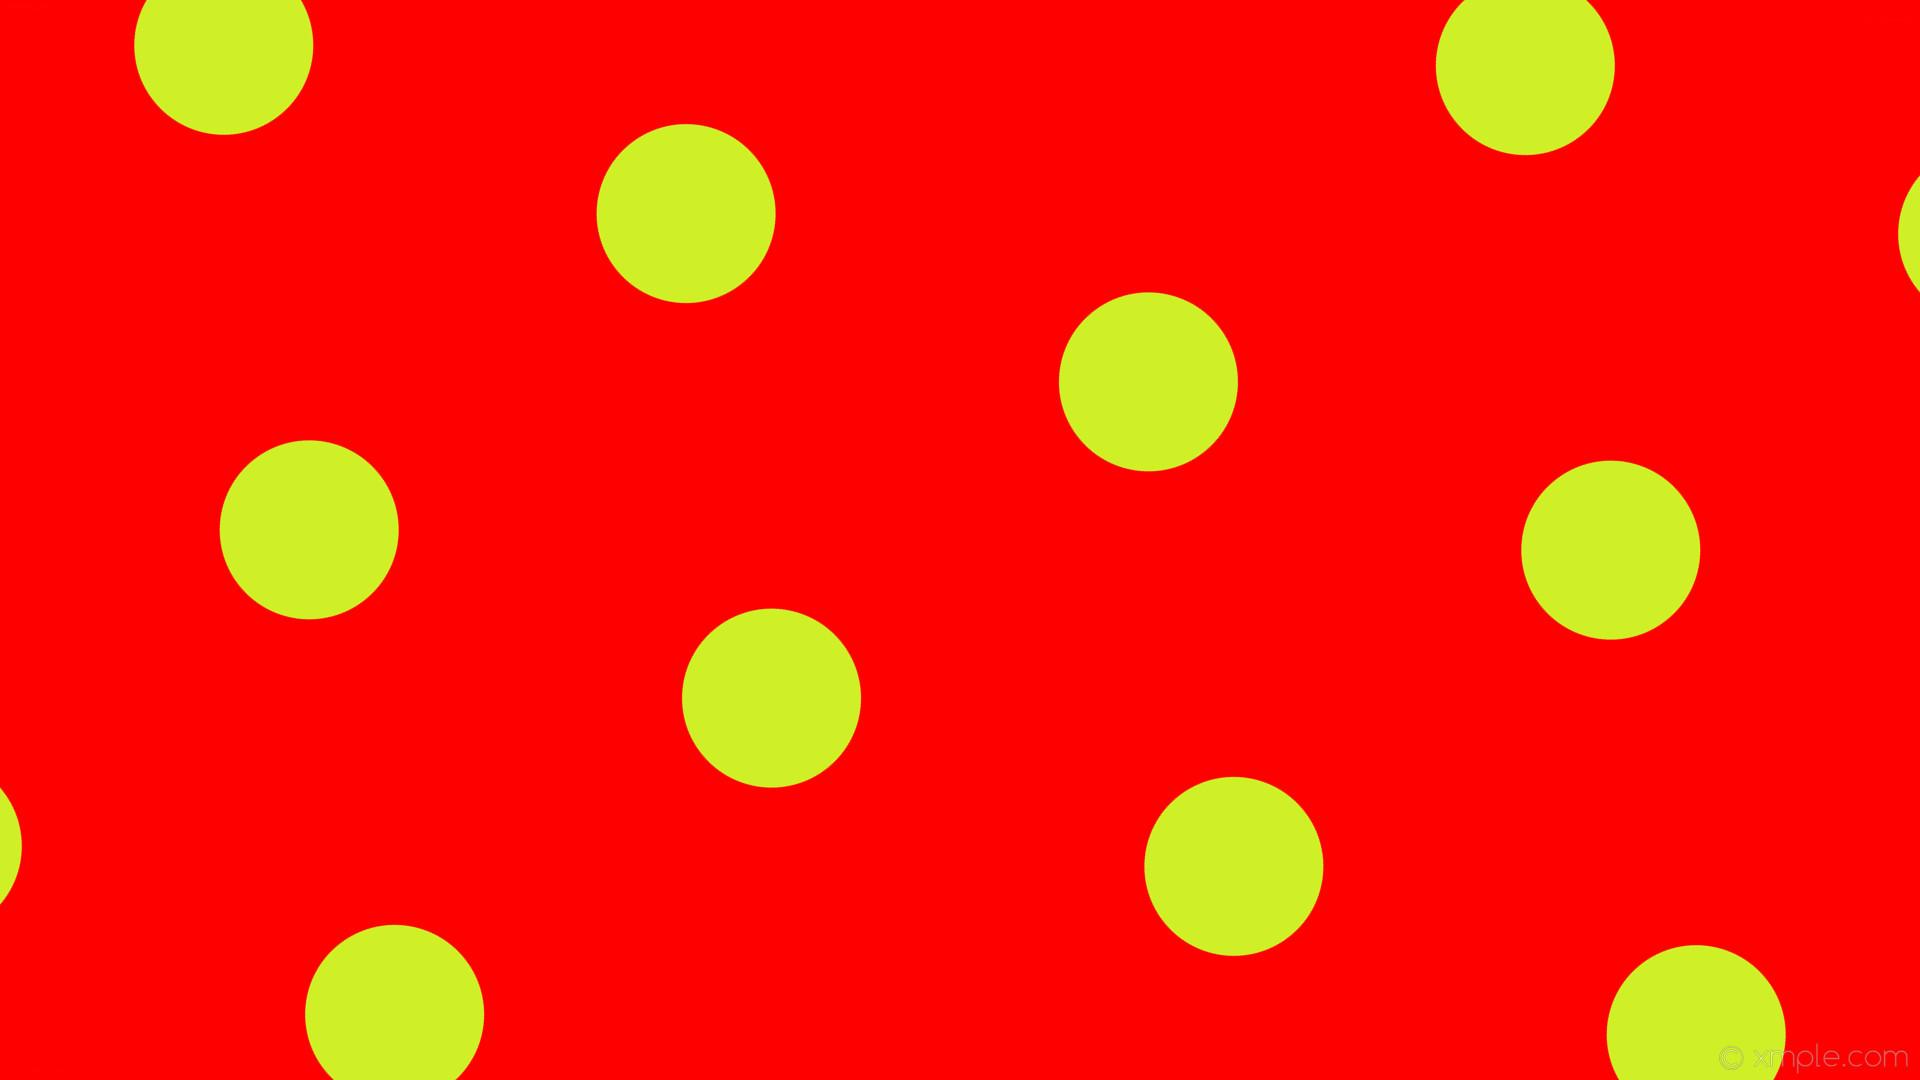 wallpaper yellow polka dots hexagon red #ff0000 #cff027 diagonal 40° 179px  492px